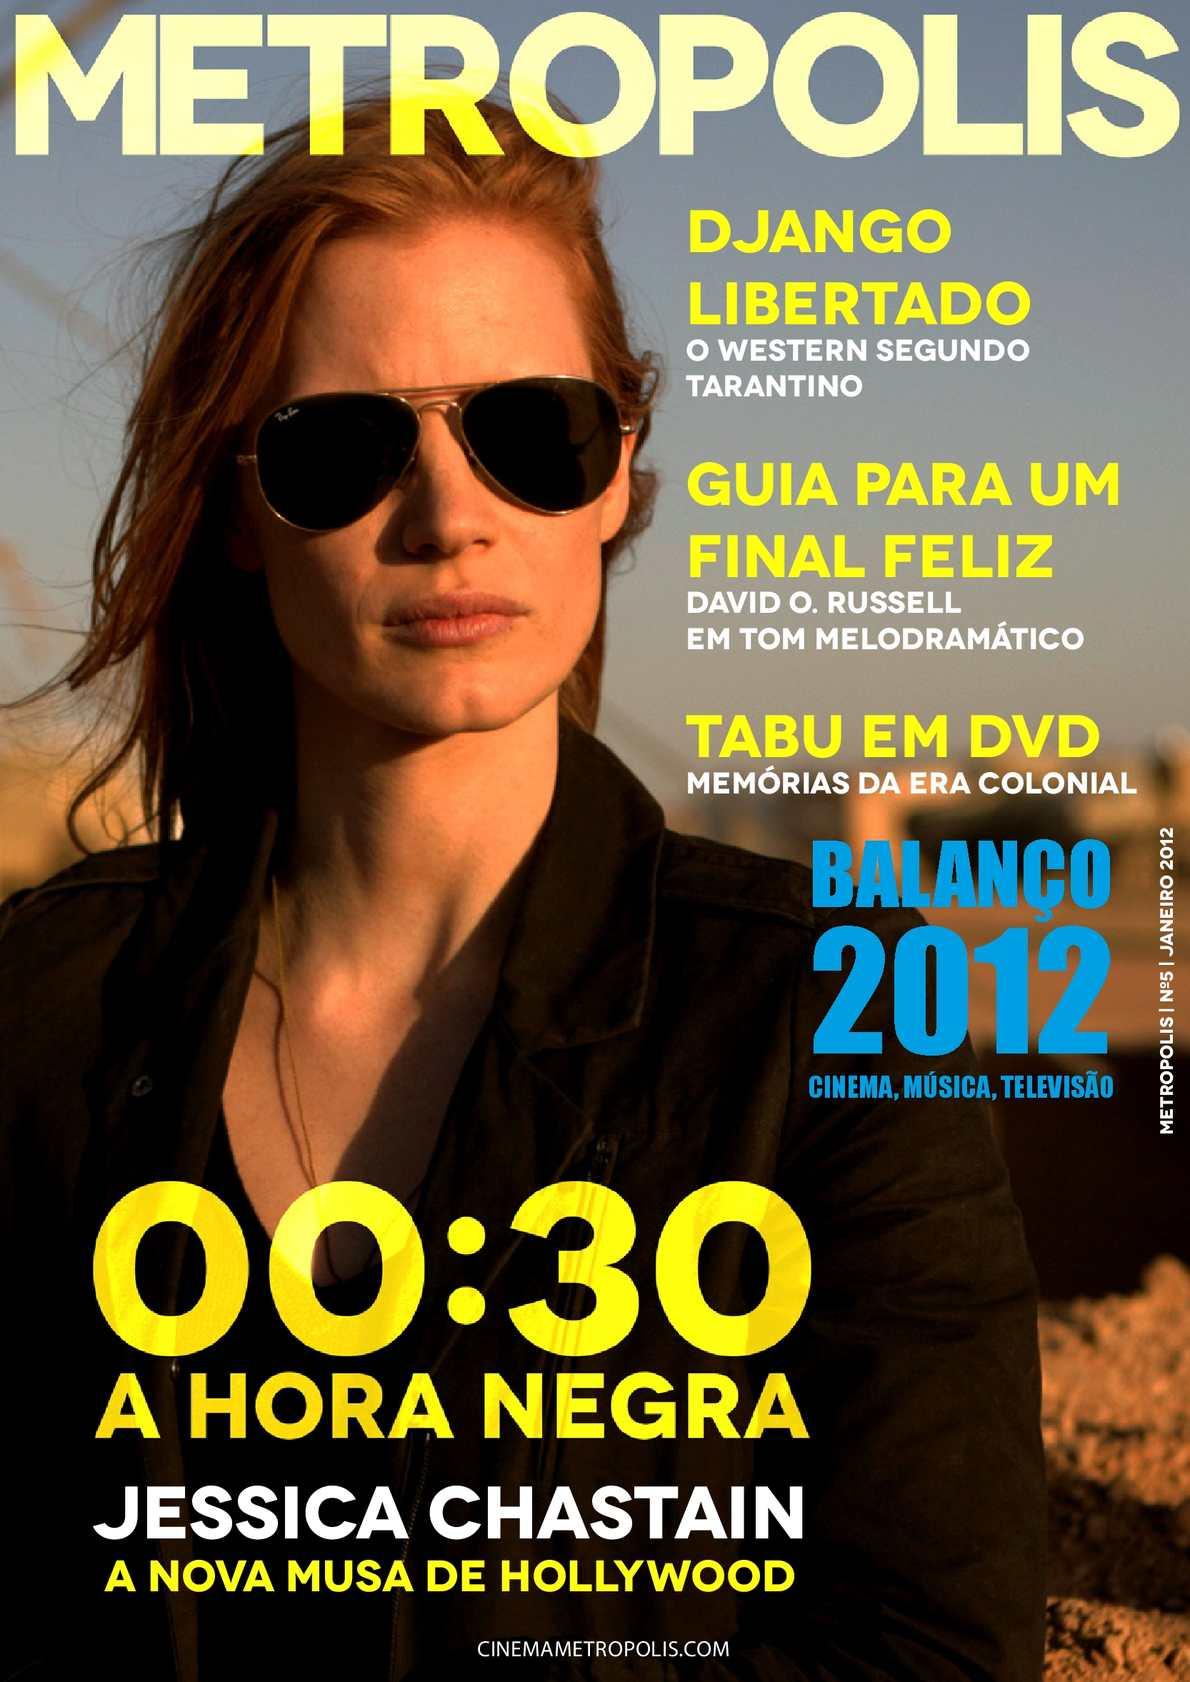 f4a0b84eddfc3 Calaméo - METROPOLIS Ed. 5 Janeiro 2013